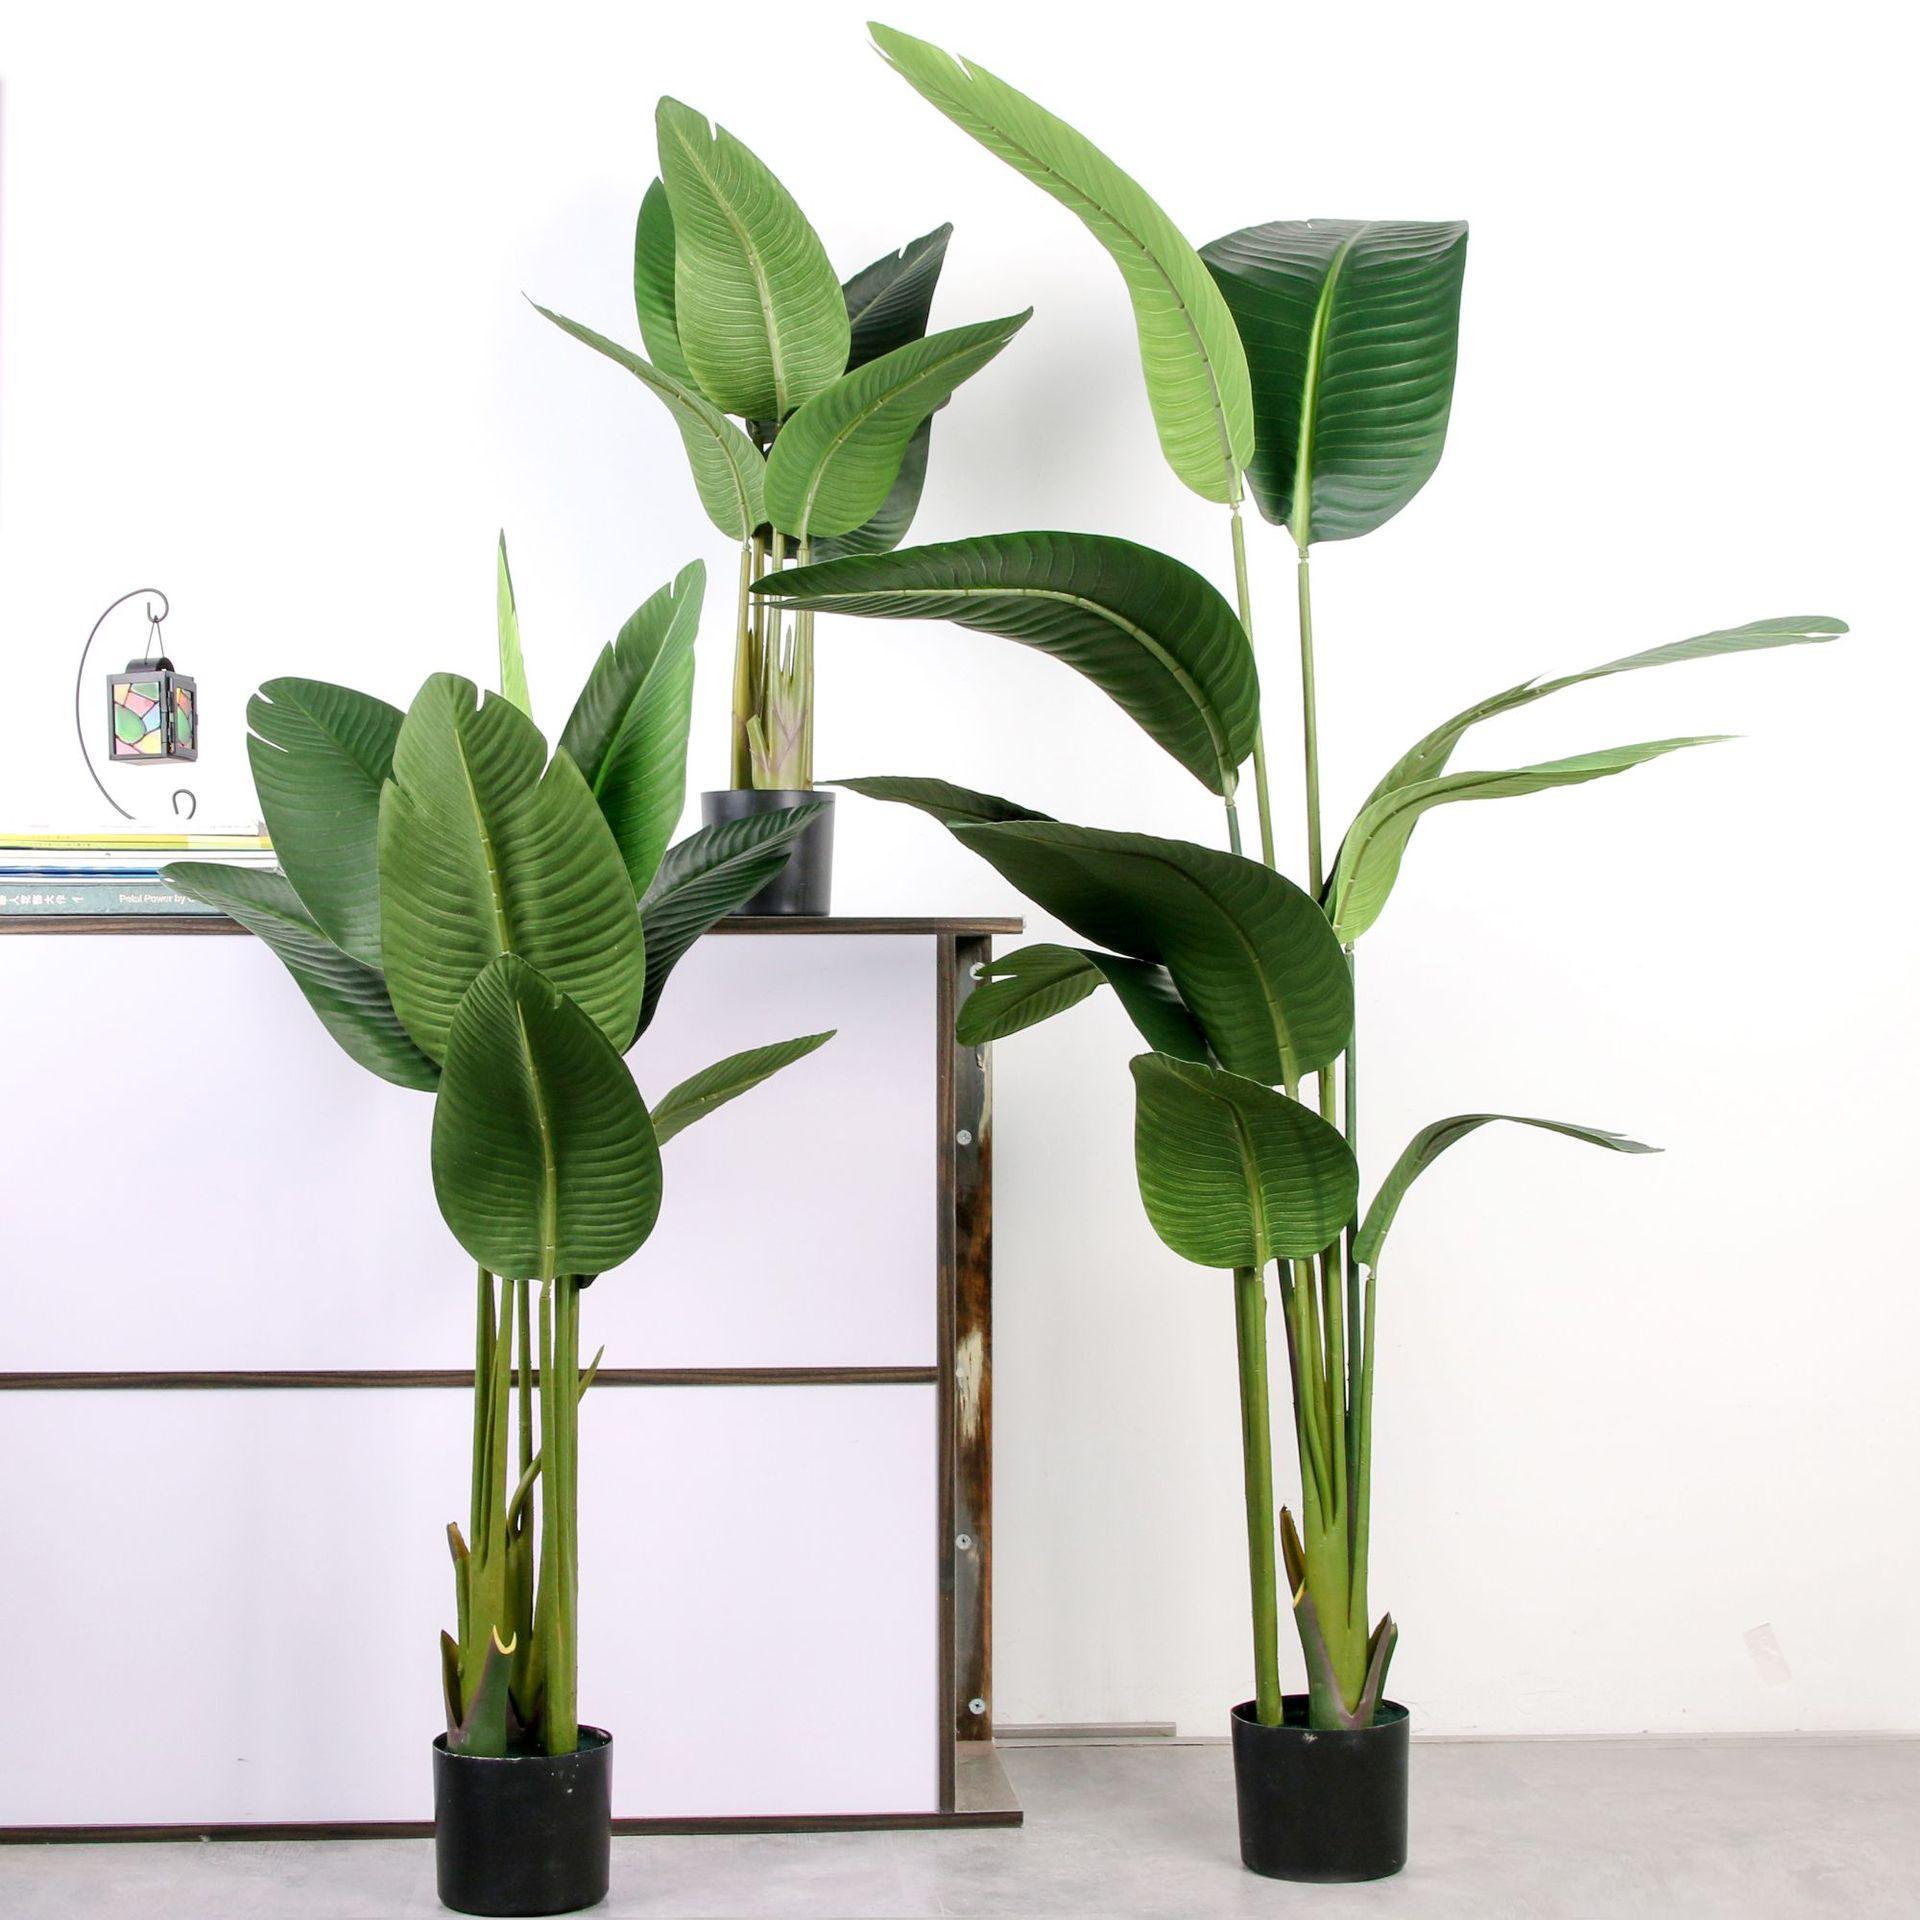 PLSQ1003-80/120/160/180/220 ซม.ประดิษฐ์พืช Traveler กล้วยตกแต่ง Canna ต้นไม้สำหรับในร่มบ้าน